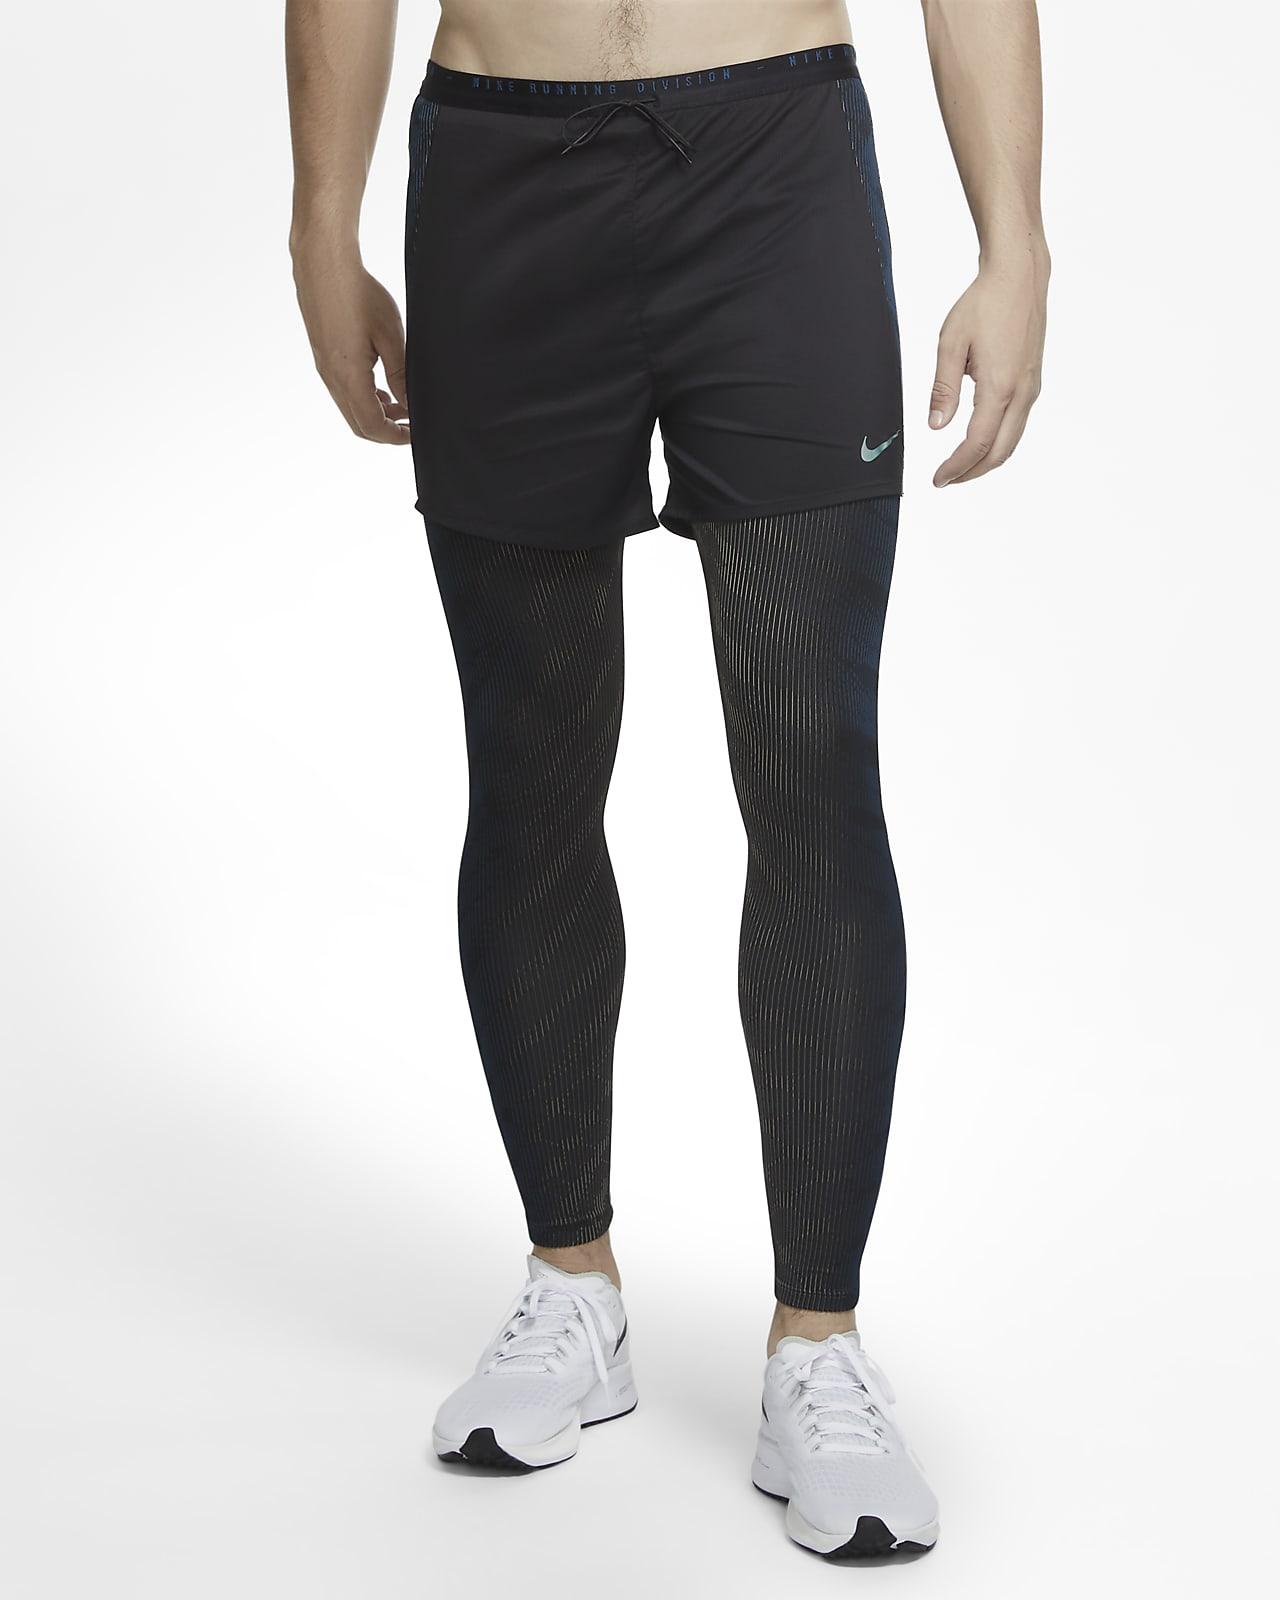 Explícitamente codicioso lavabo  Mallas de running híbridas para hombre Nike Run Division. Nike.com